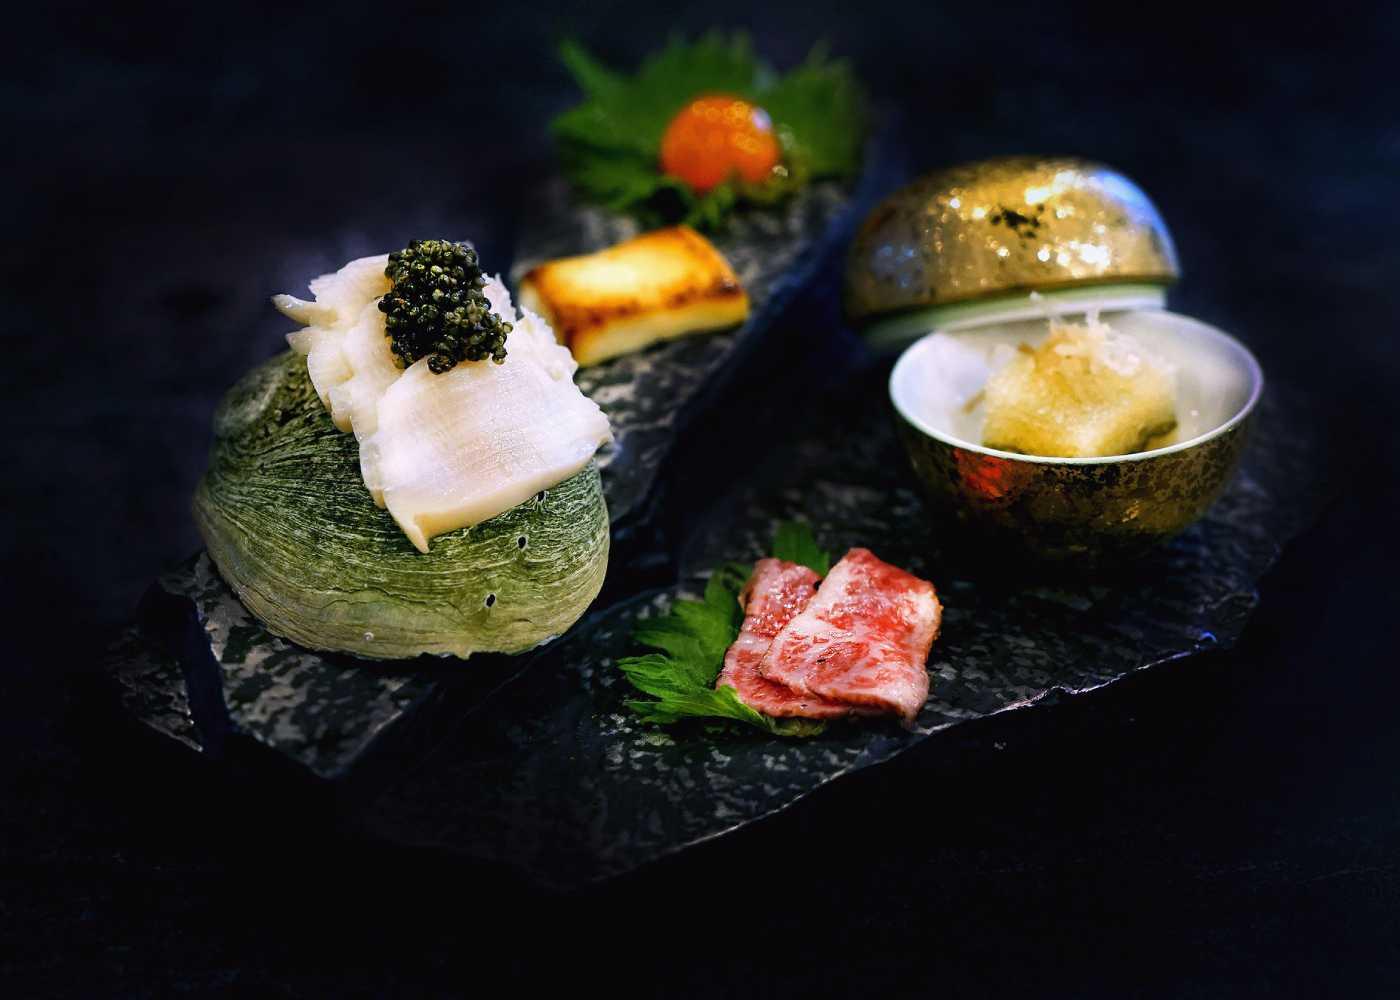 Feast at Fat Cow's Fuyu Matsuri Wagyu Omakase Menu